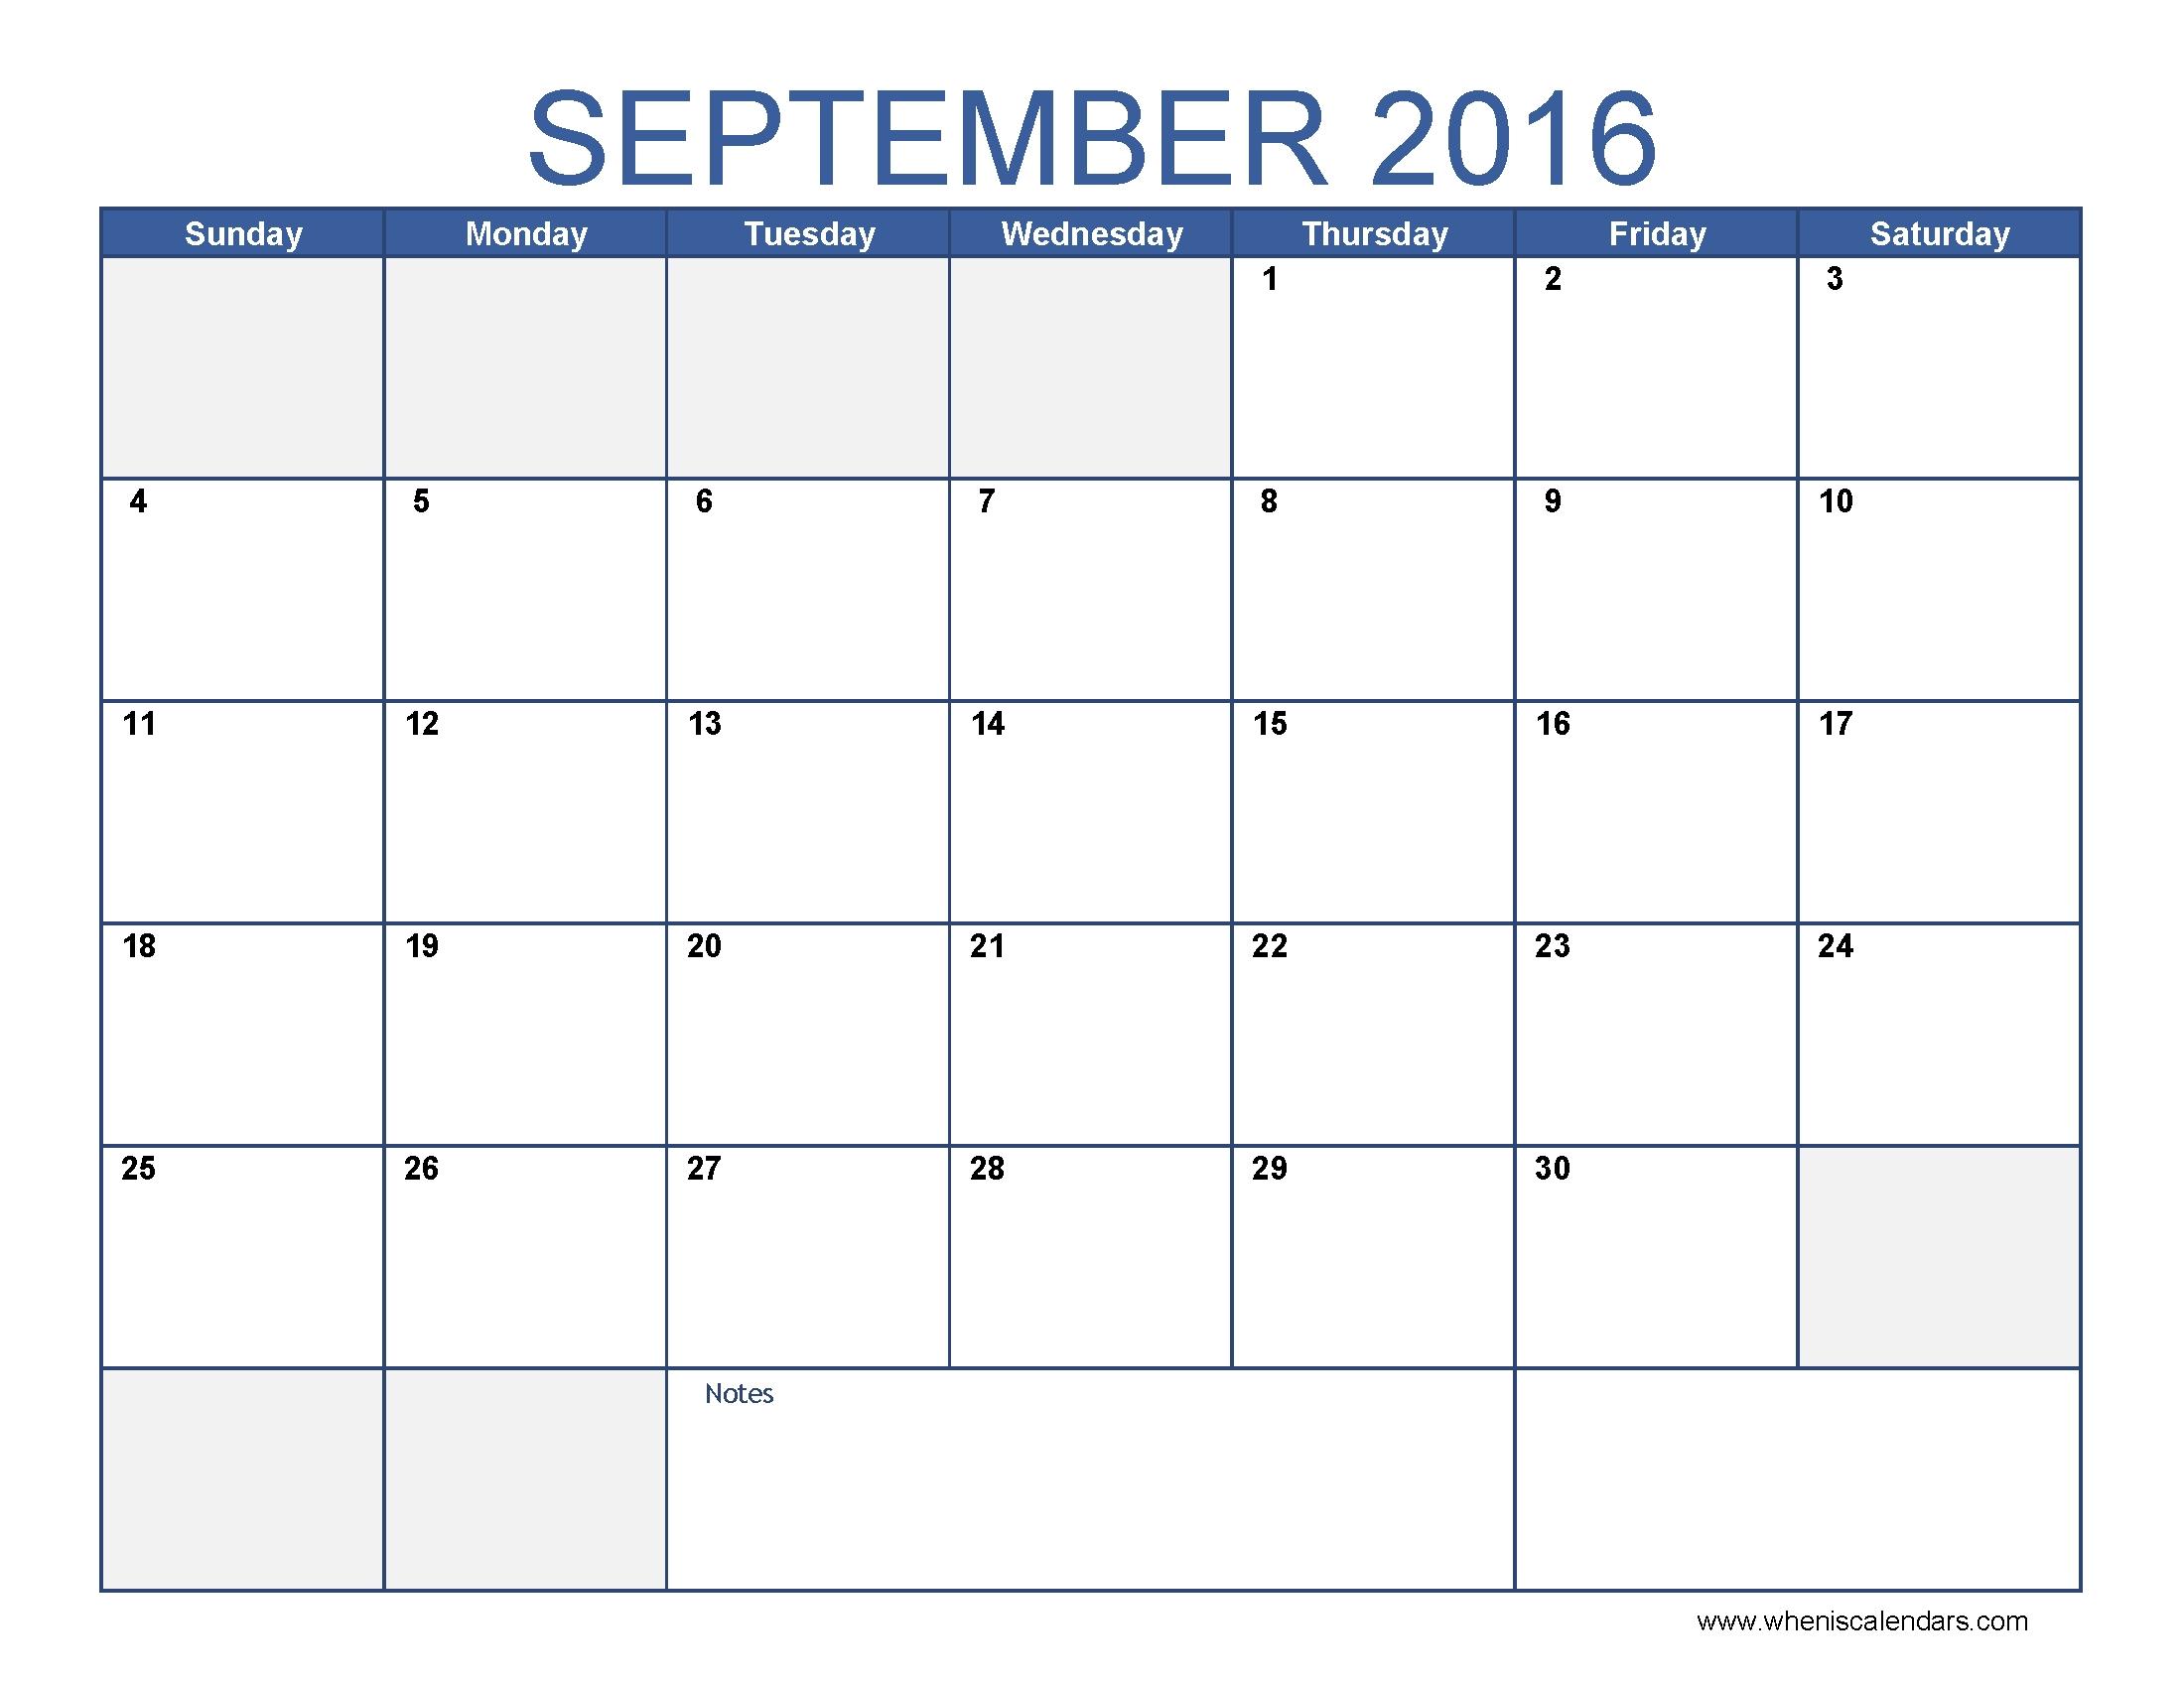 September 2016 Calendar Excel #september2016 #excelcalendar pertaining to Calendar For The Month Of September